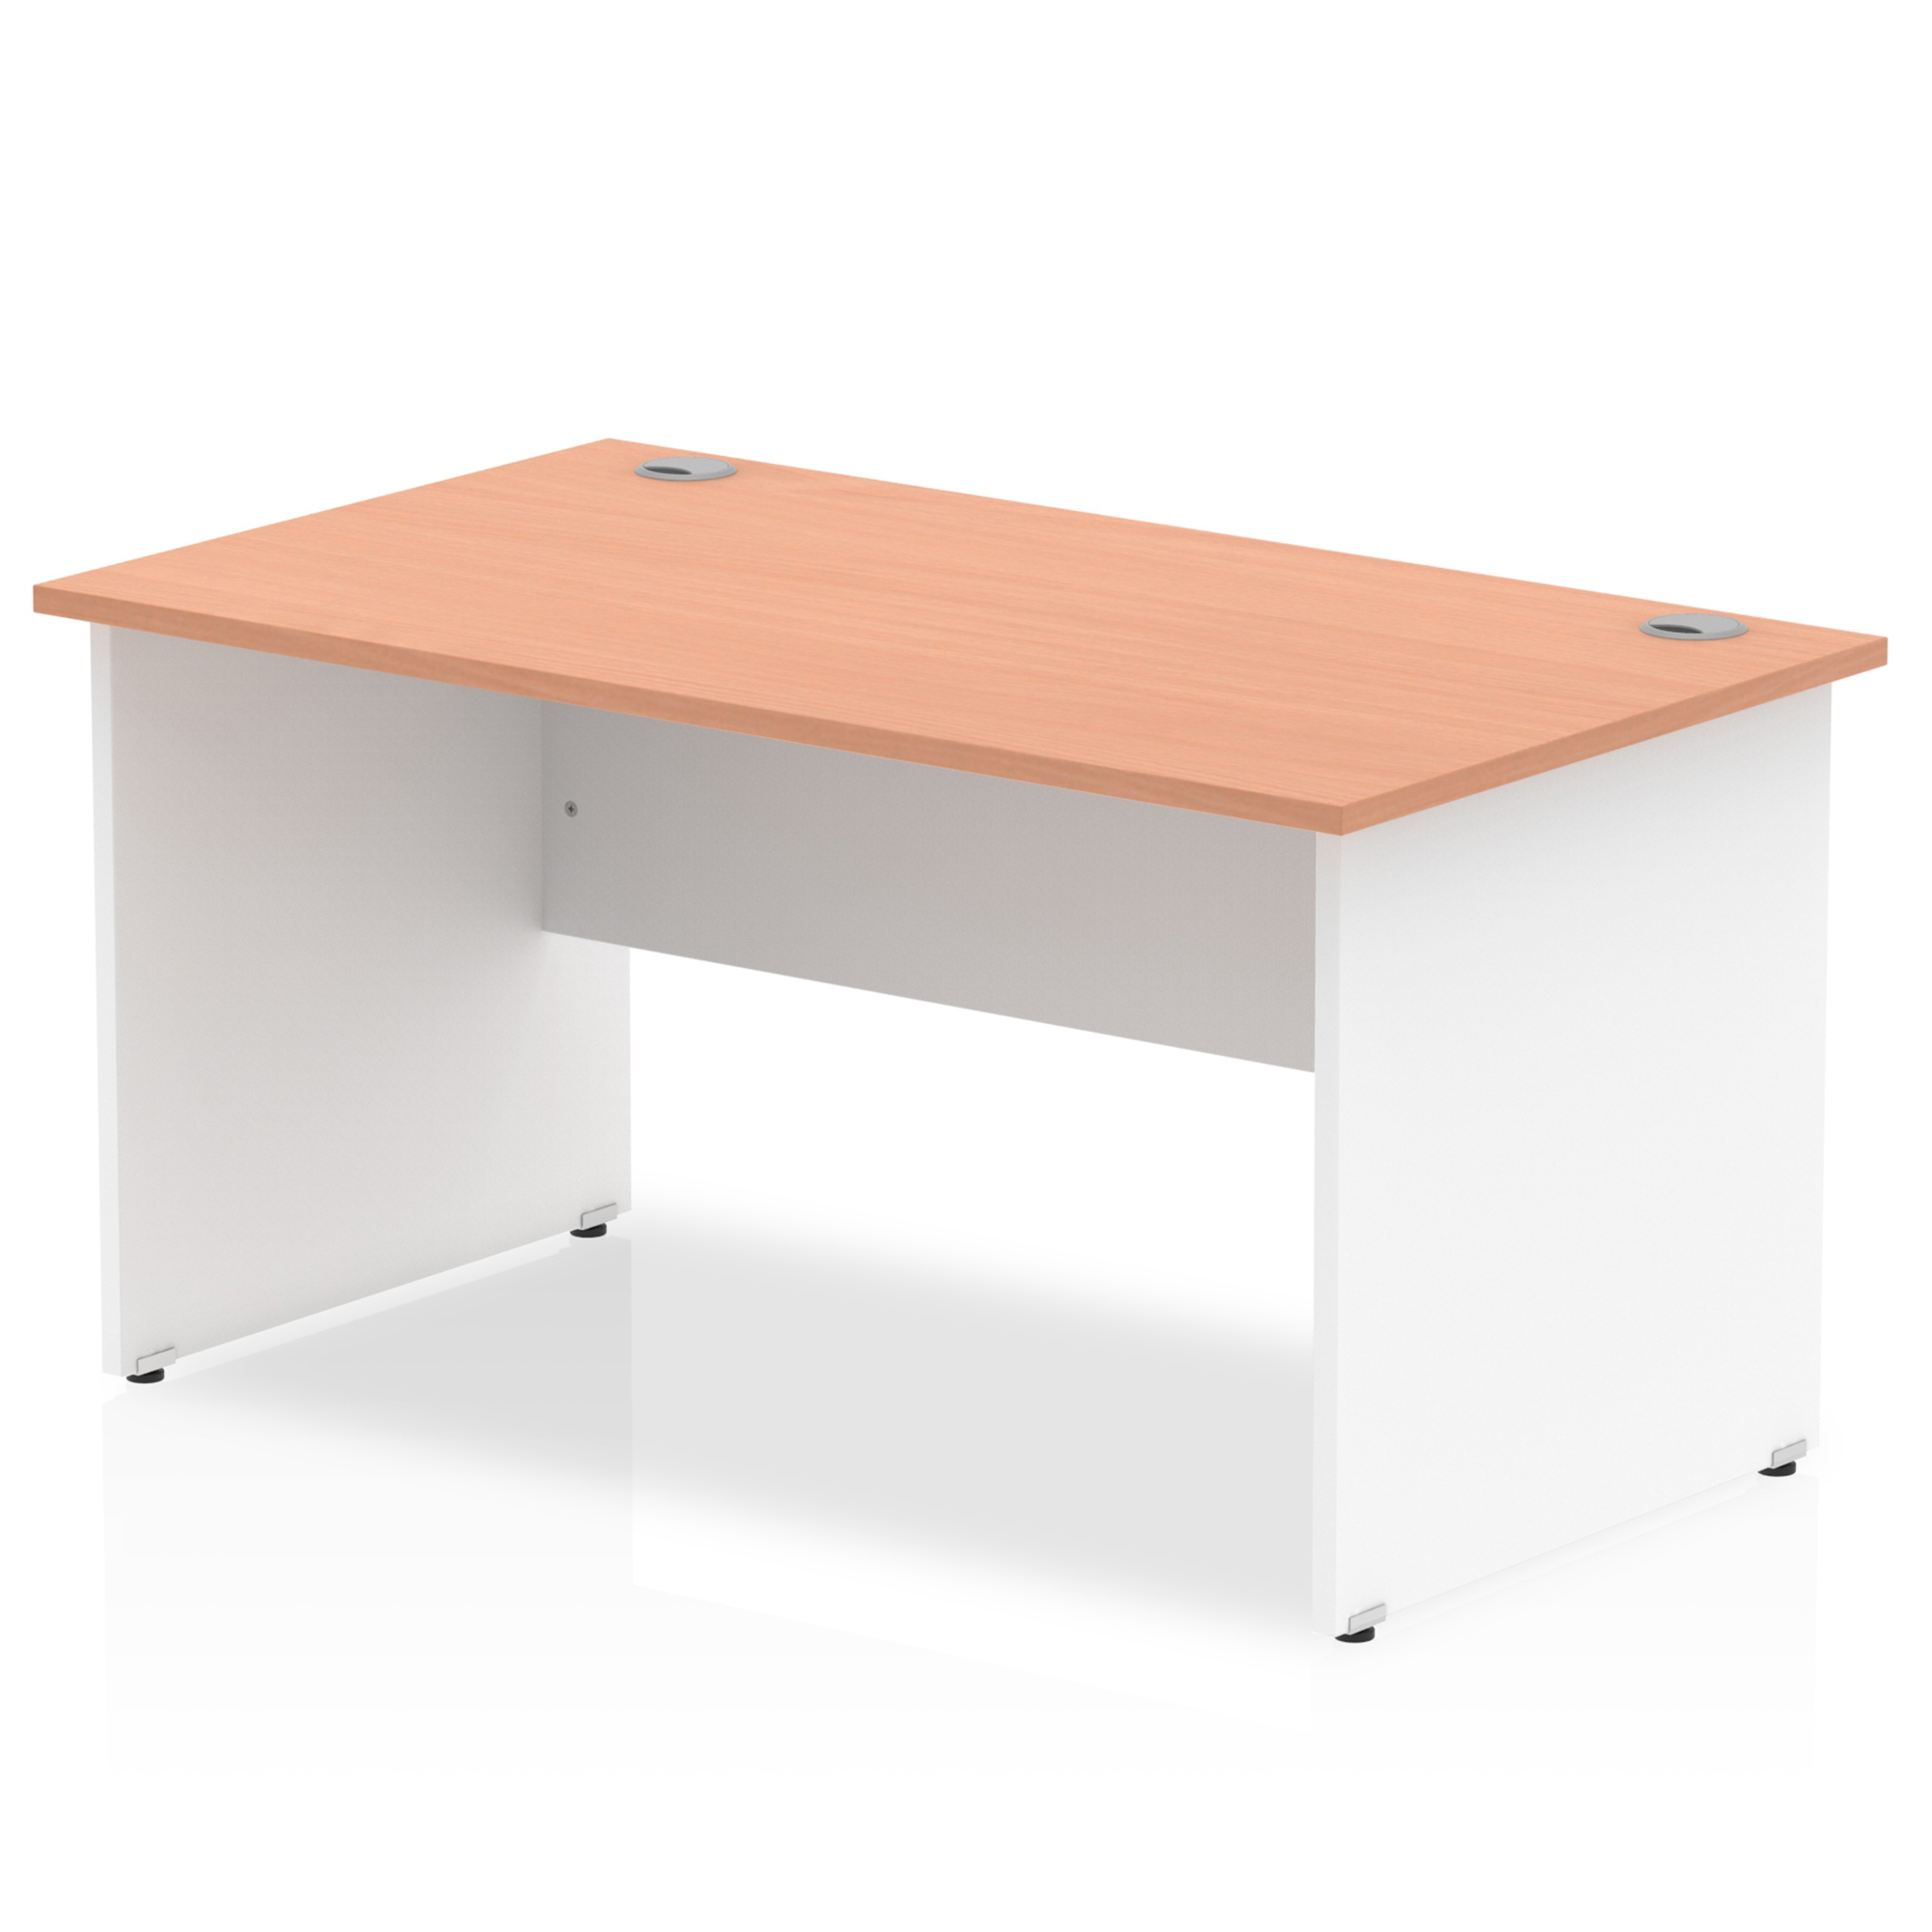 Trexus Desk Rectangle Panel End 1400x800mm Beech Top White Panels Ref TT000009